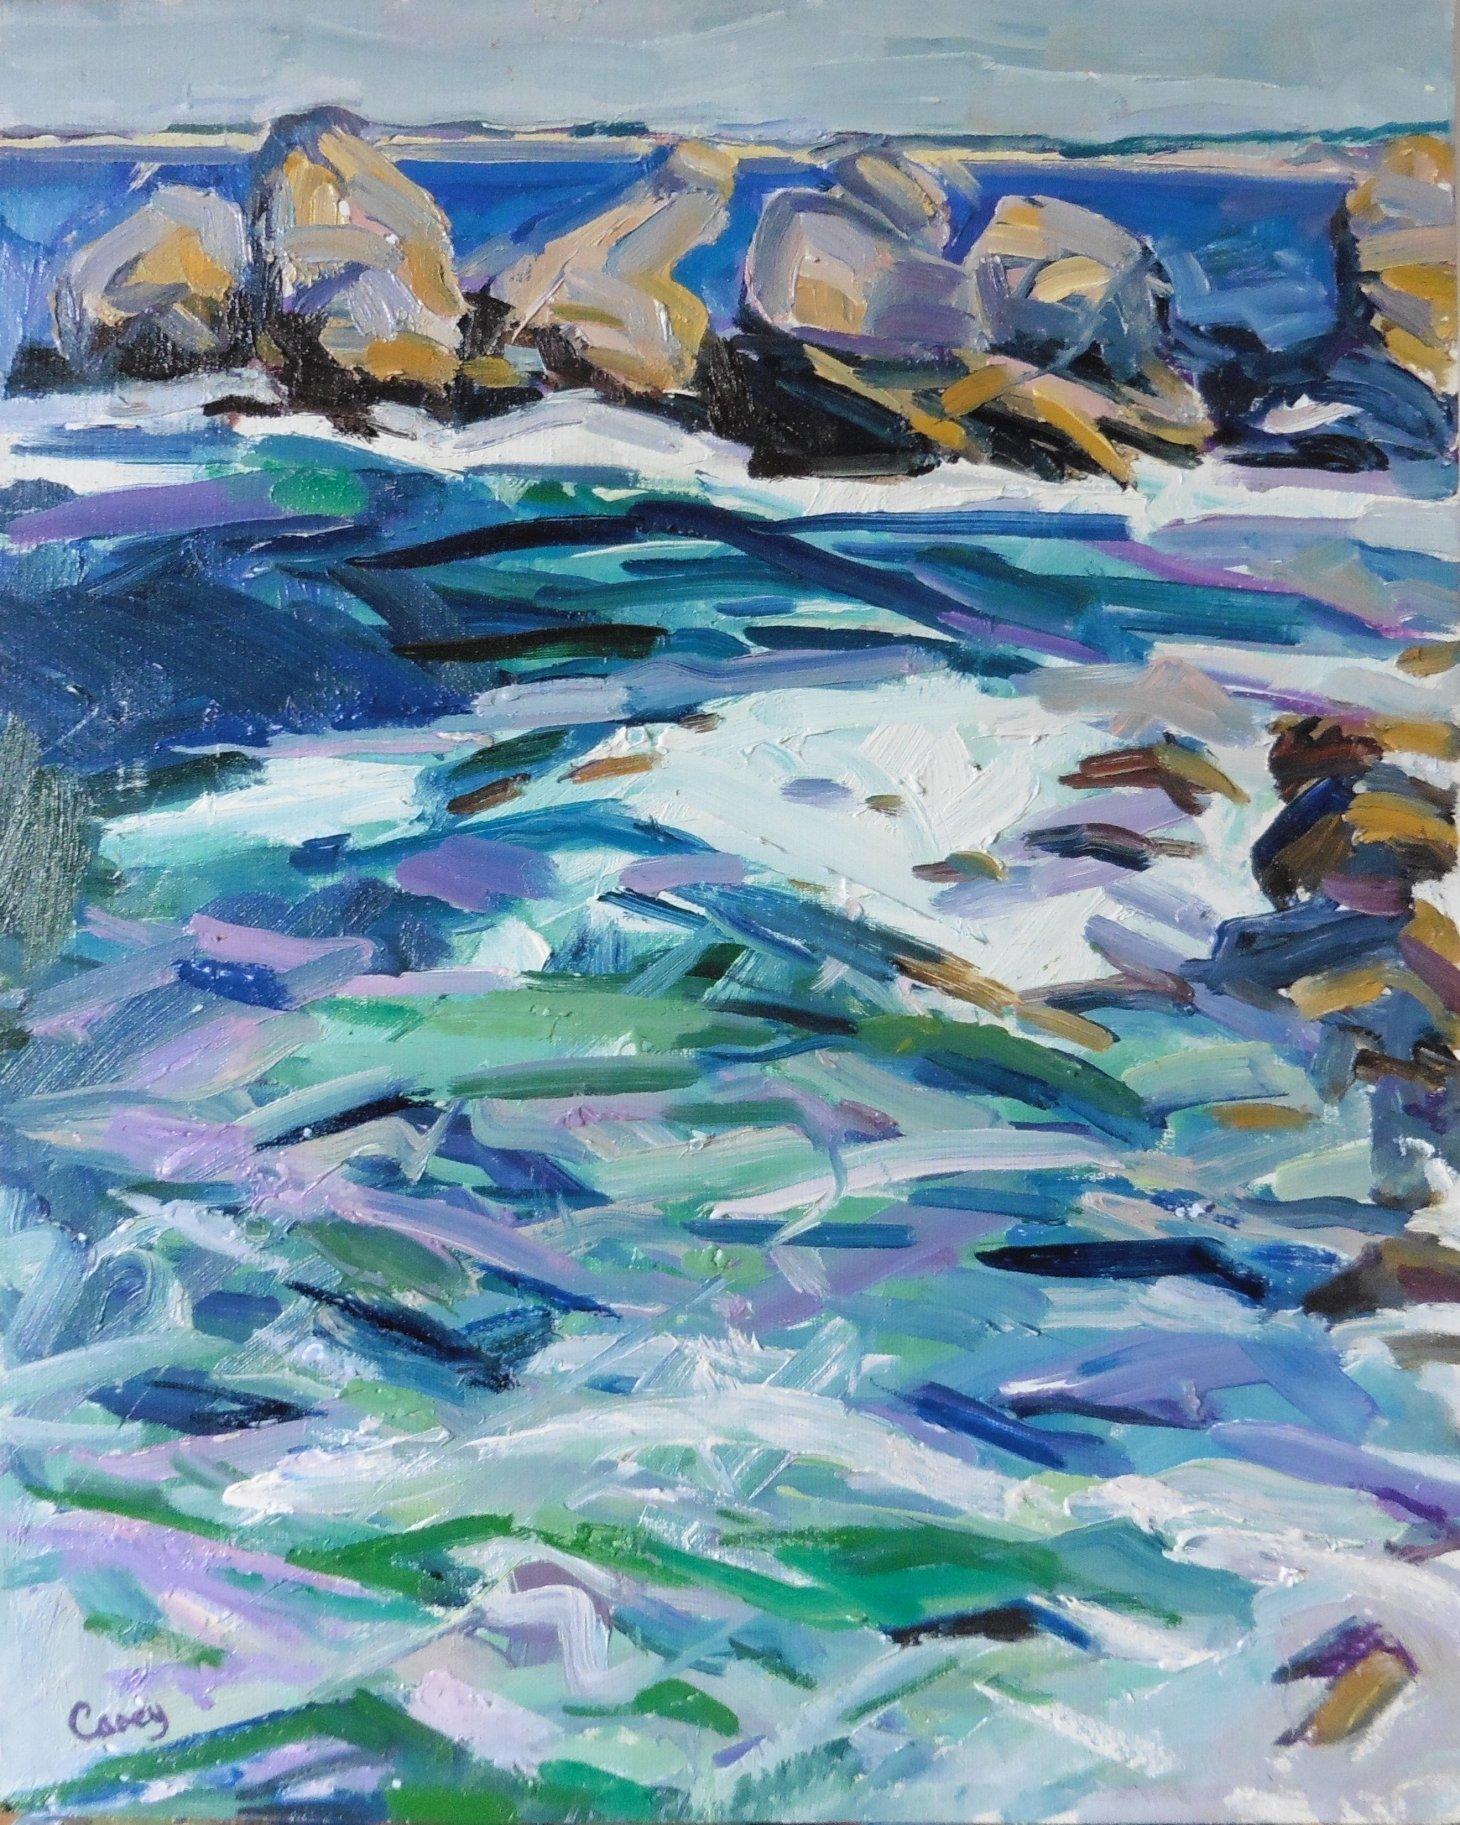 buy_cornish_art-jim_carey-the_sea_is_wild_today